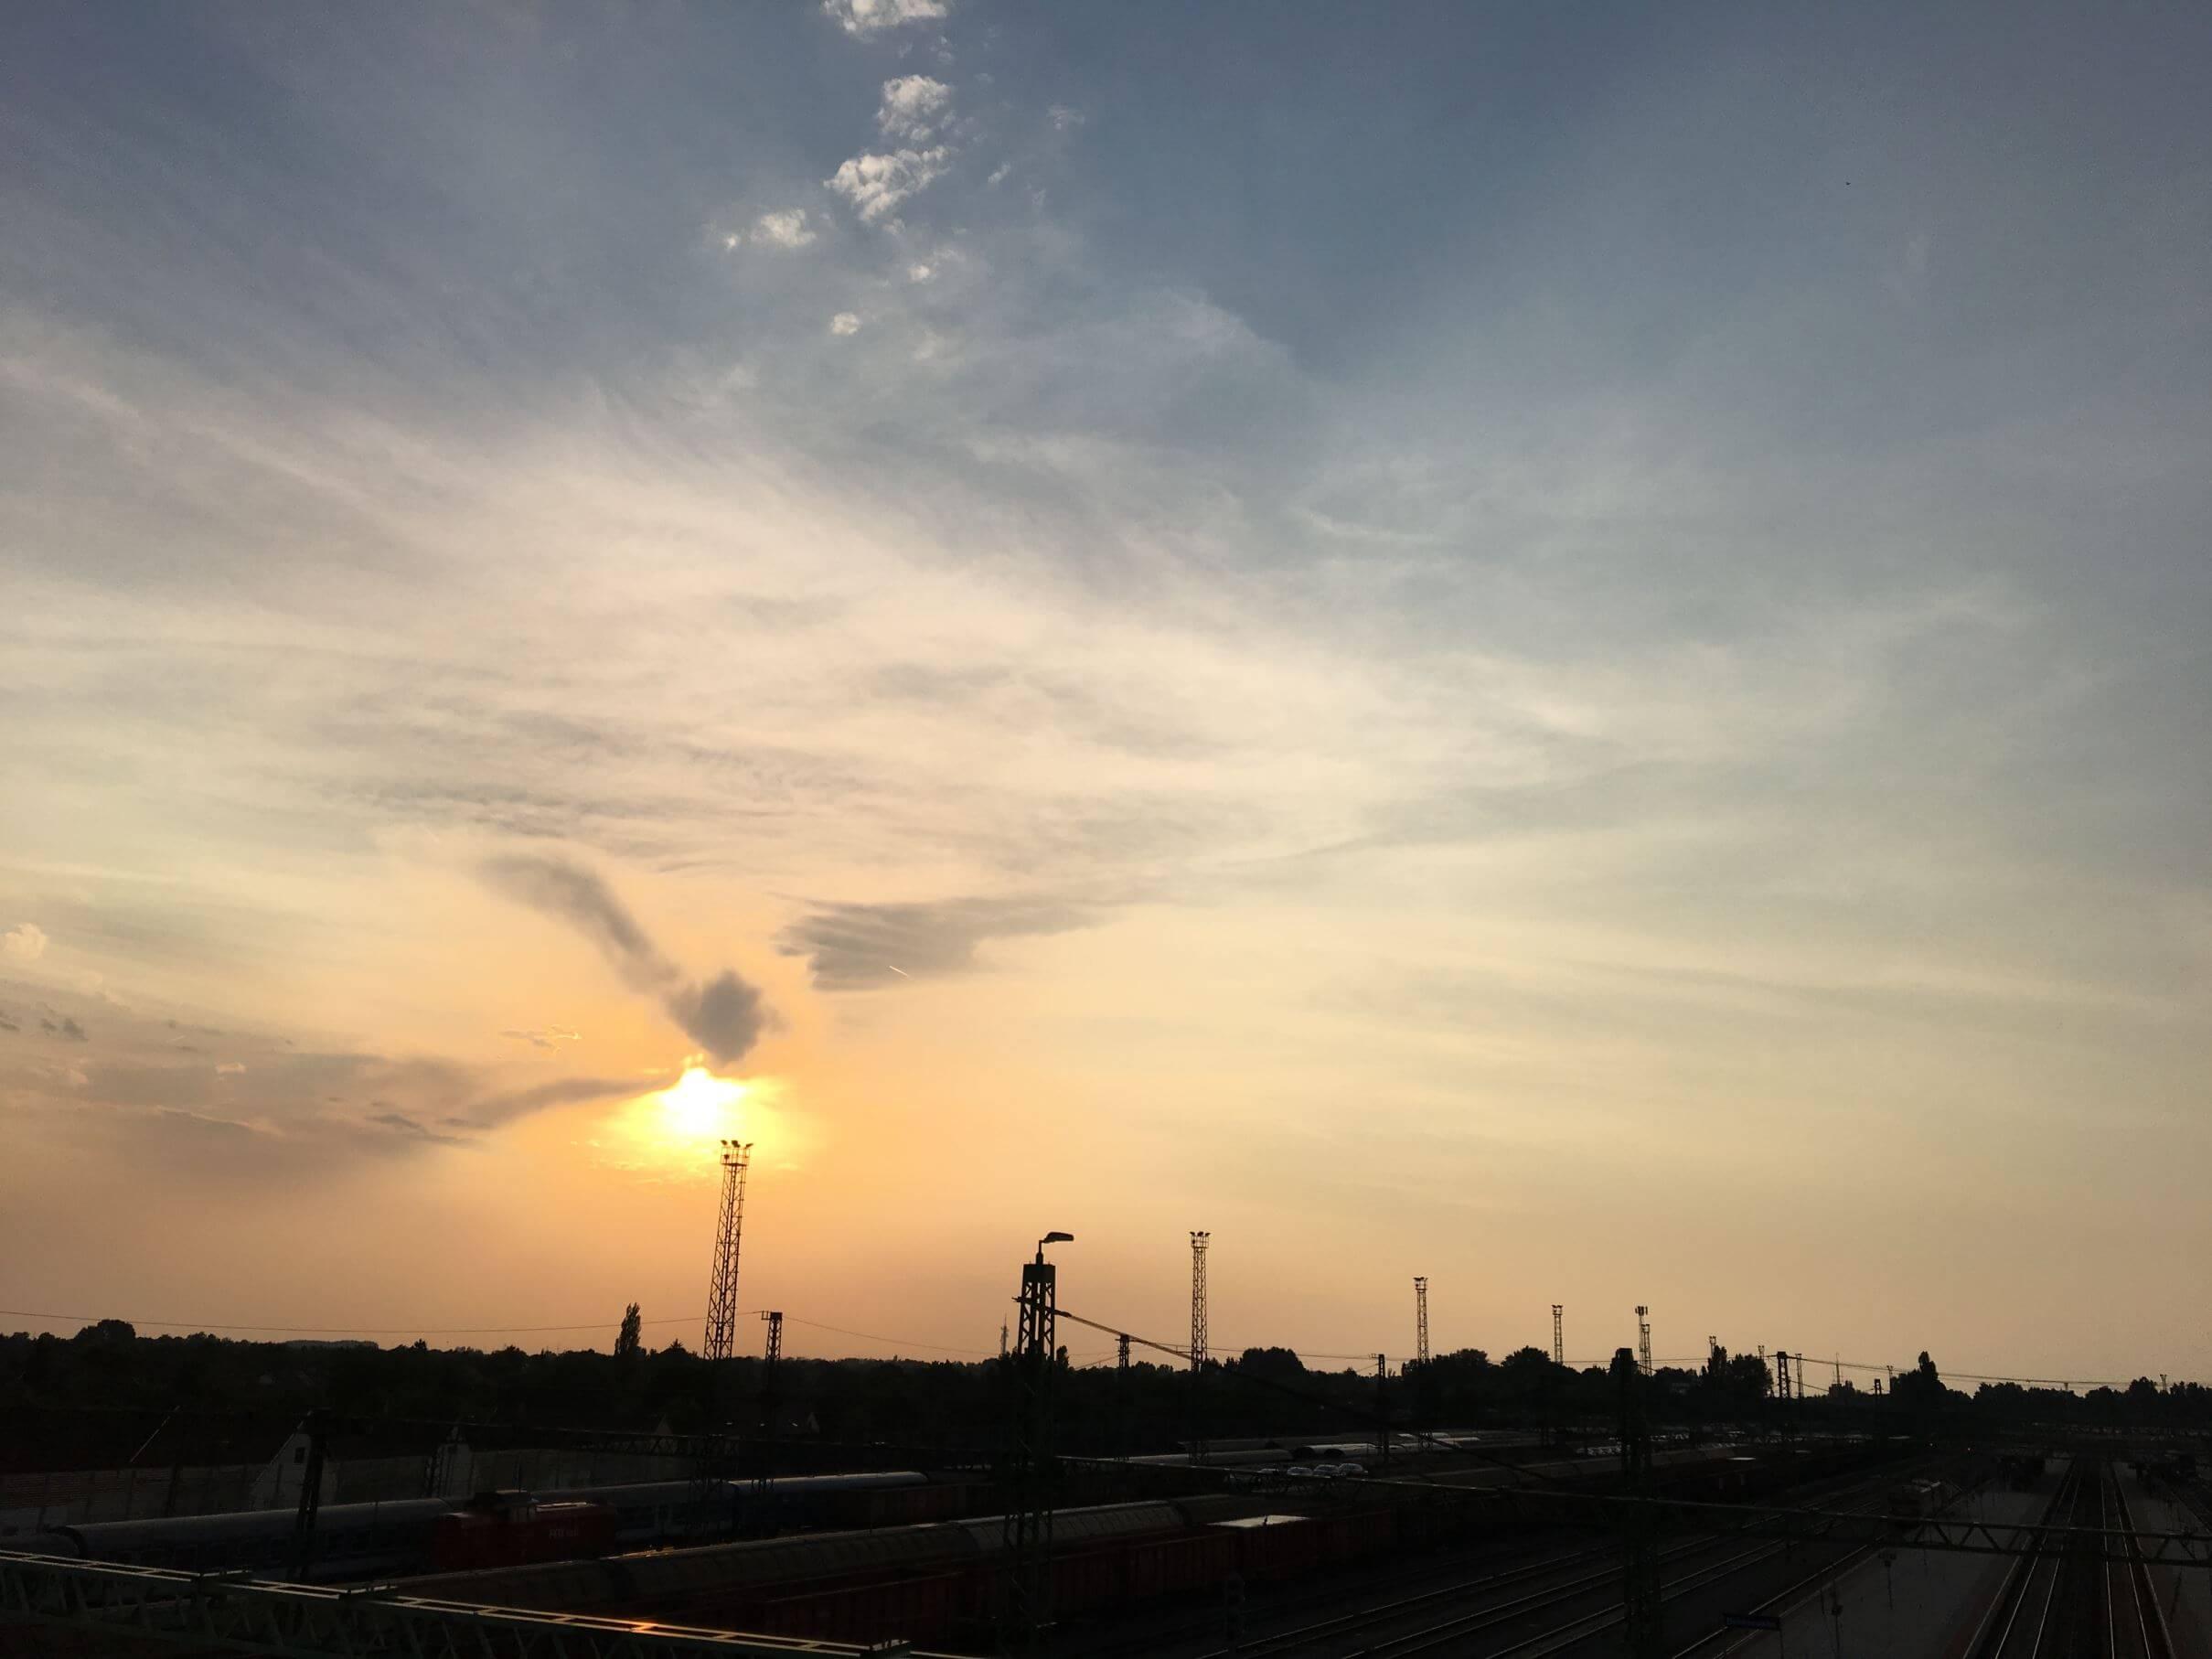 Sunset at Bekescsaba New Bridge